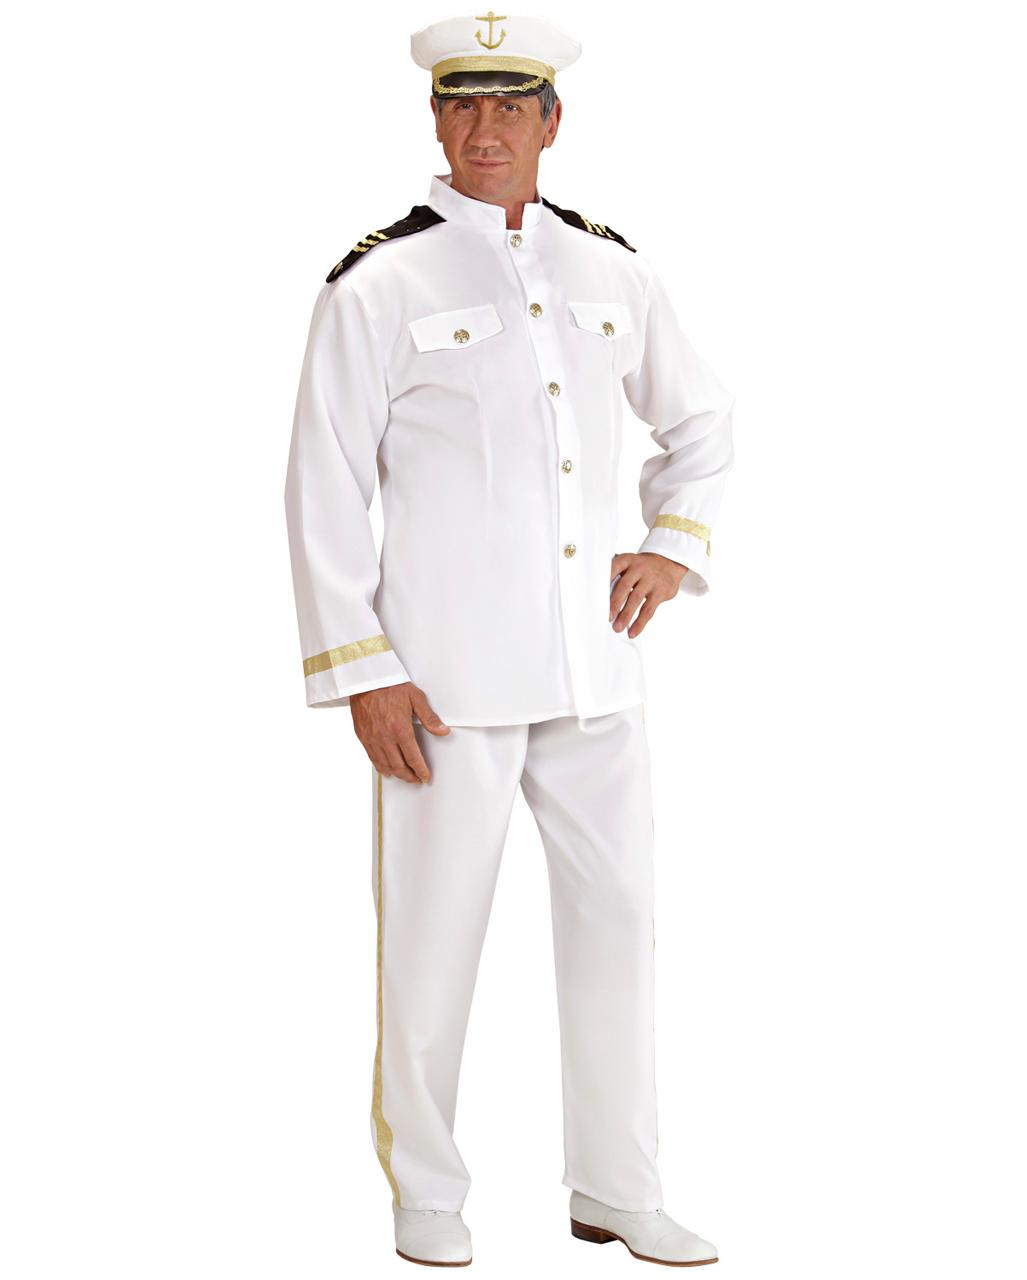 marine kapit n kost m m kapit n marinekapit n uniform horror. Black Bedroom Furniture Sets. Home Design Ideas